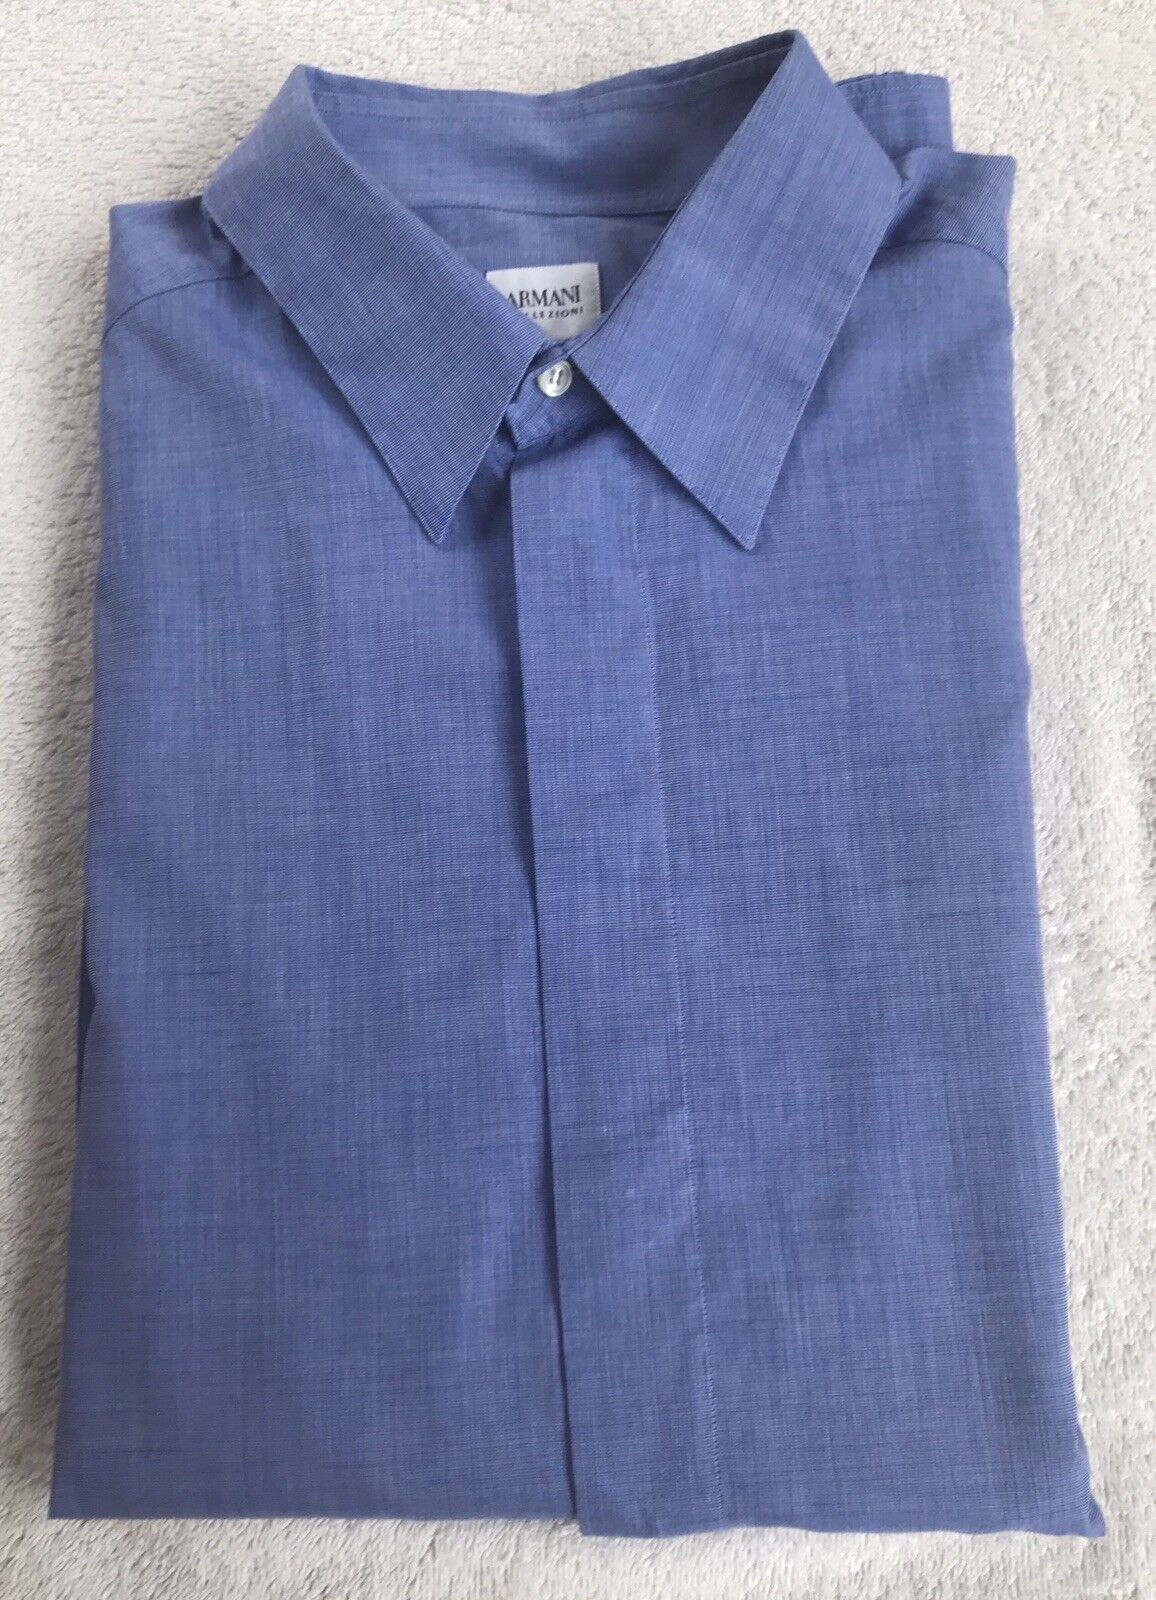 Armani Collezioni Men'sDesignerShirt - Mid bluee - 17ich Collar